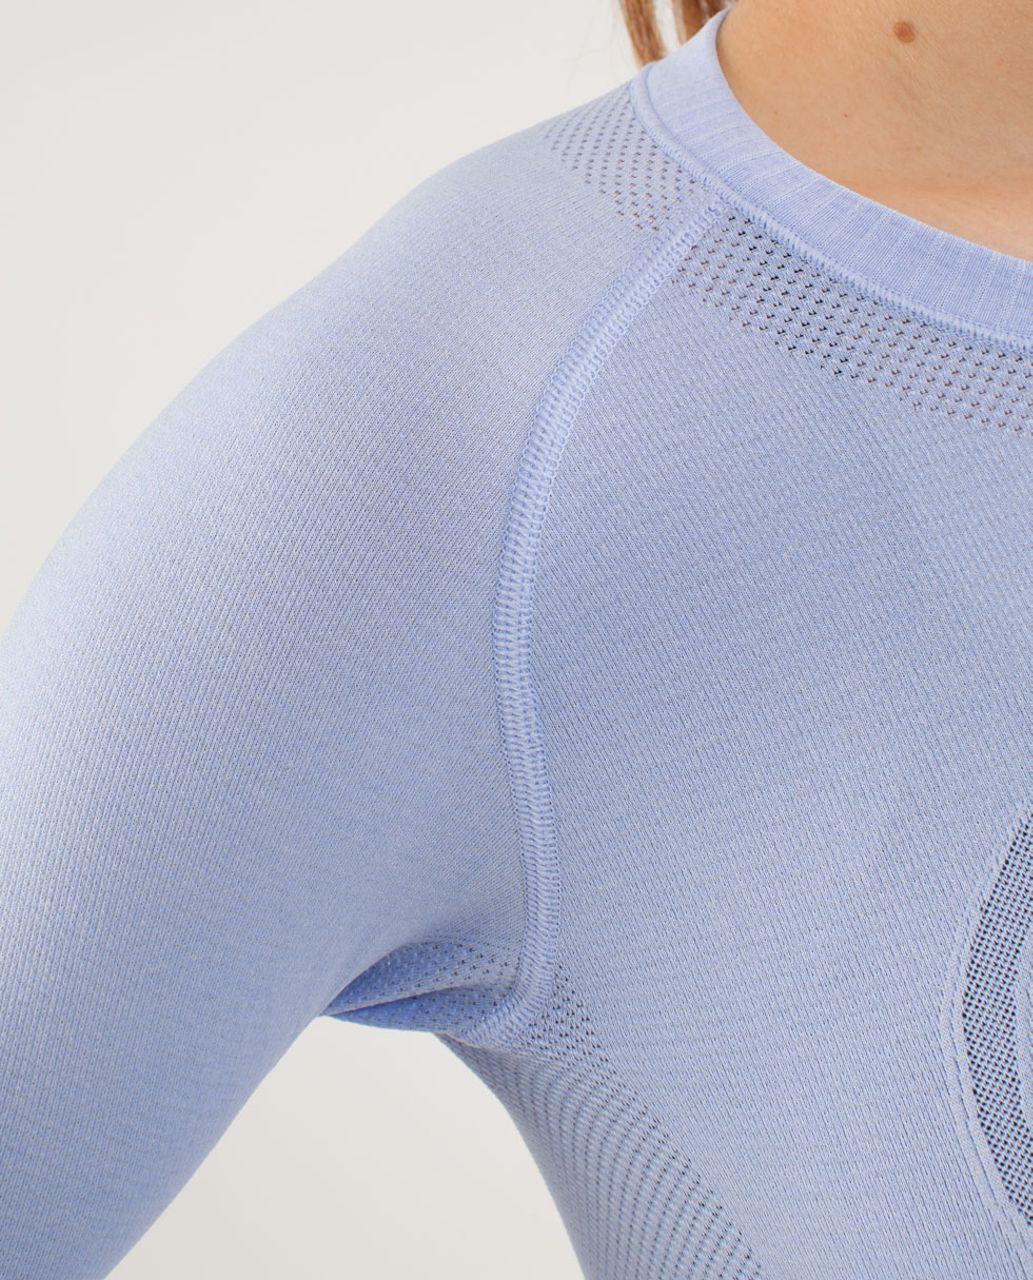 Lululemon Run:  Swiftly Tech Long Sleeve - Lavender Dusk